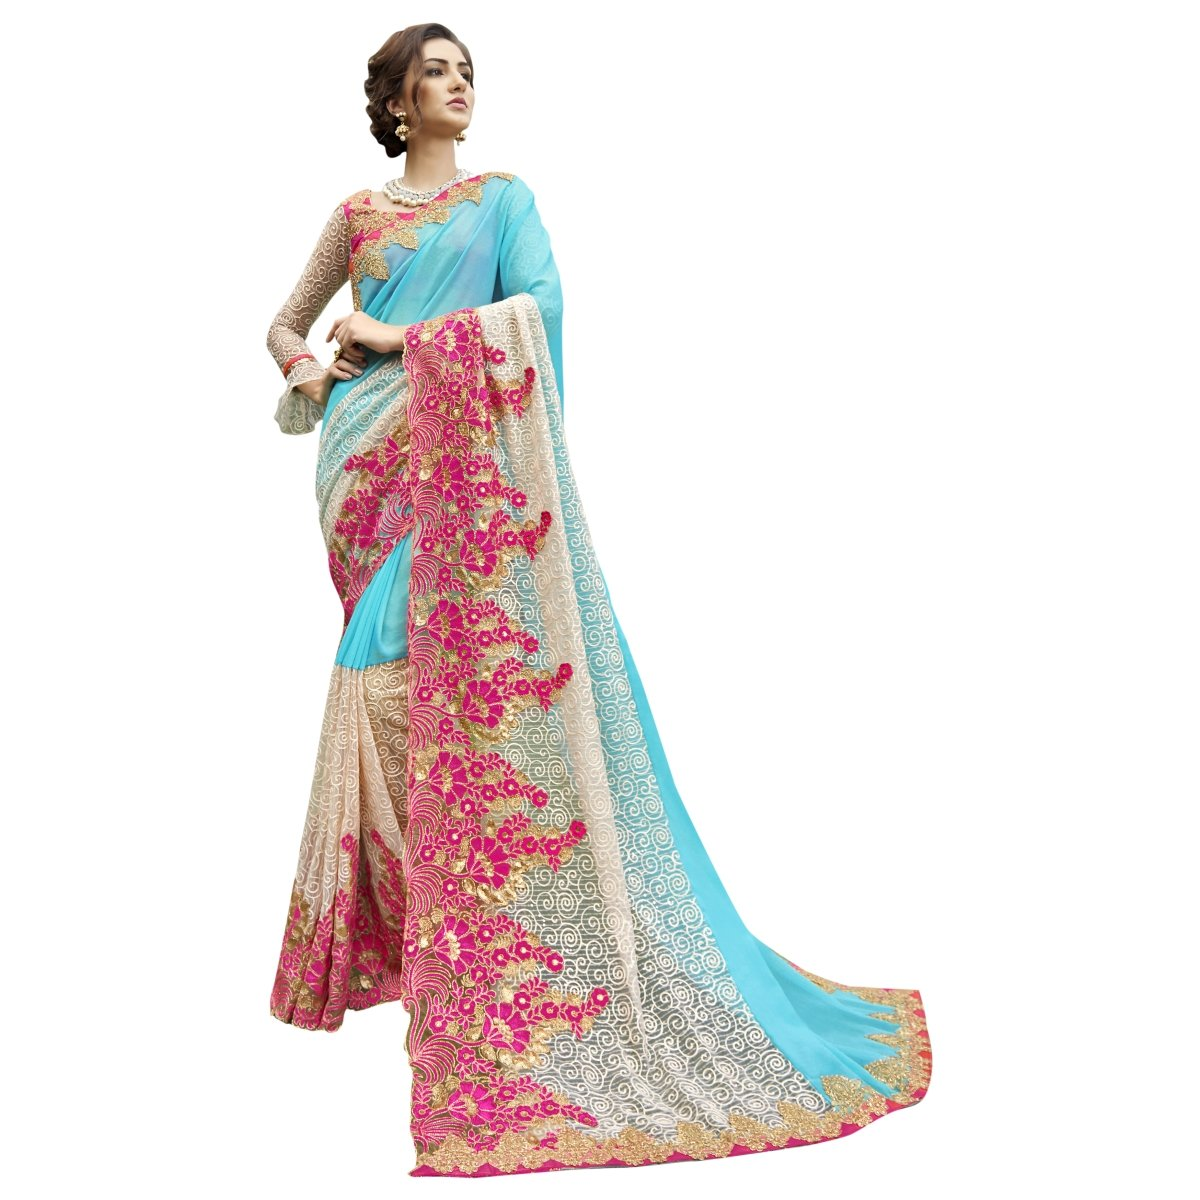 Aksaa Fashion Women's Indian SkyBlue Embroidered Chiffon Net Partywear Saree, Sari AKTSN96085